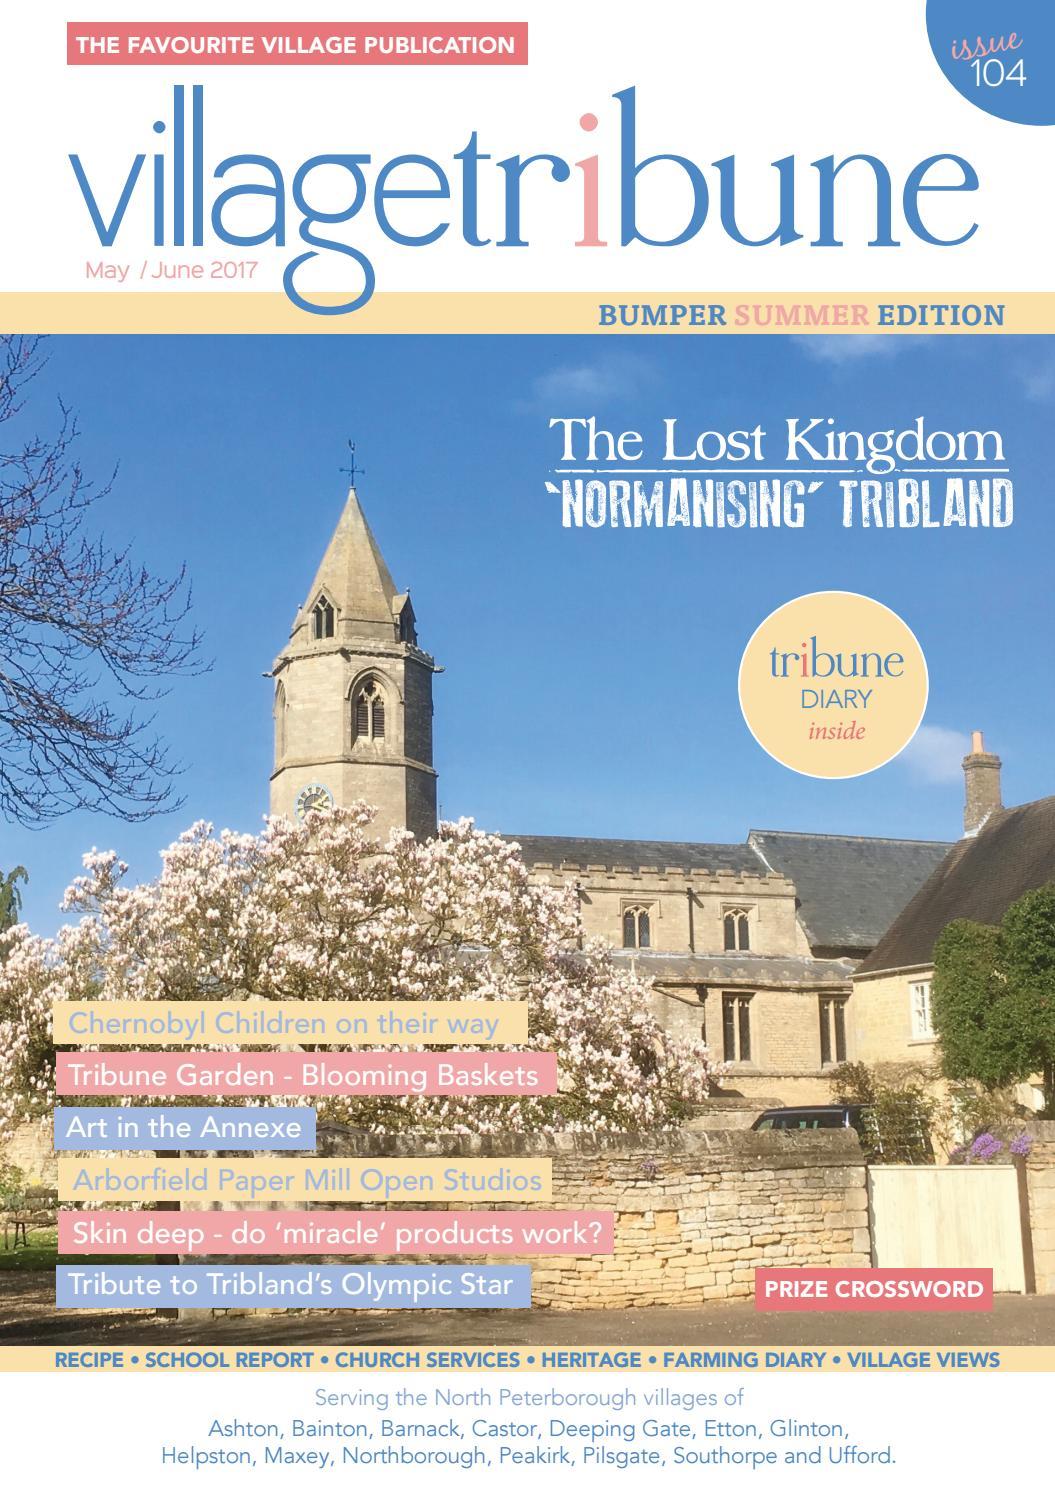 Village Tribune 104 by Dimension6000 - issuu